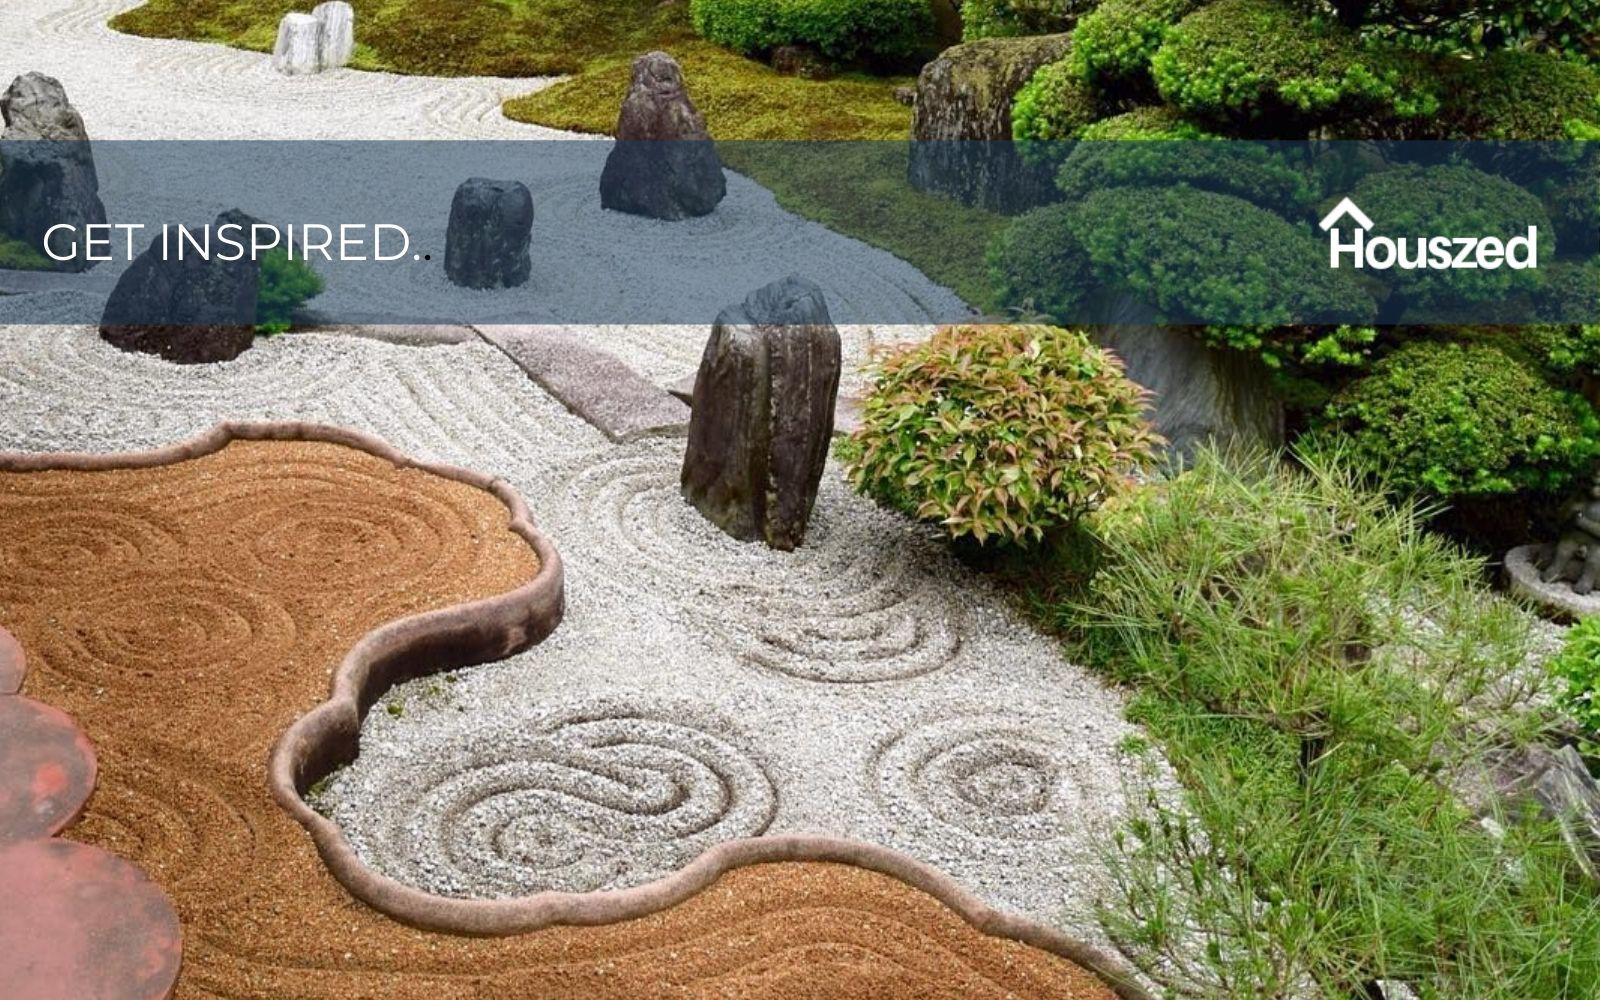 17+ Zen Garden Ideas That Relax Your Mind in 2020 | Houszed